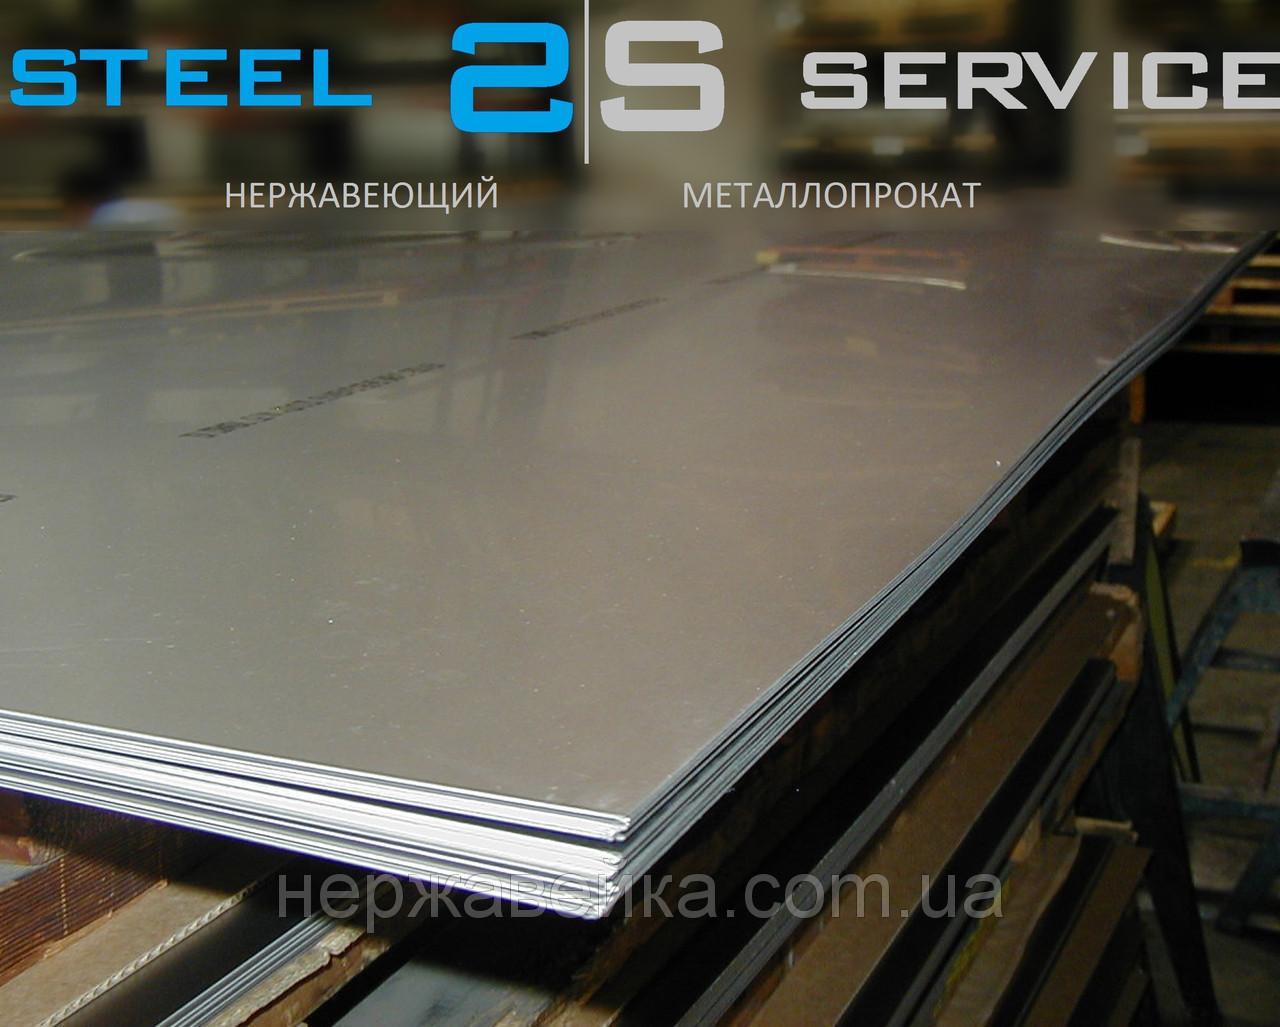 Нержавейка лист 4х1000х2000мм  AISI  316L(03Х17Н14М3) 2B - матовый,  кислотостойкий